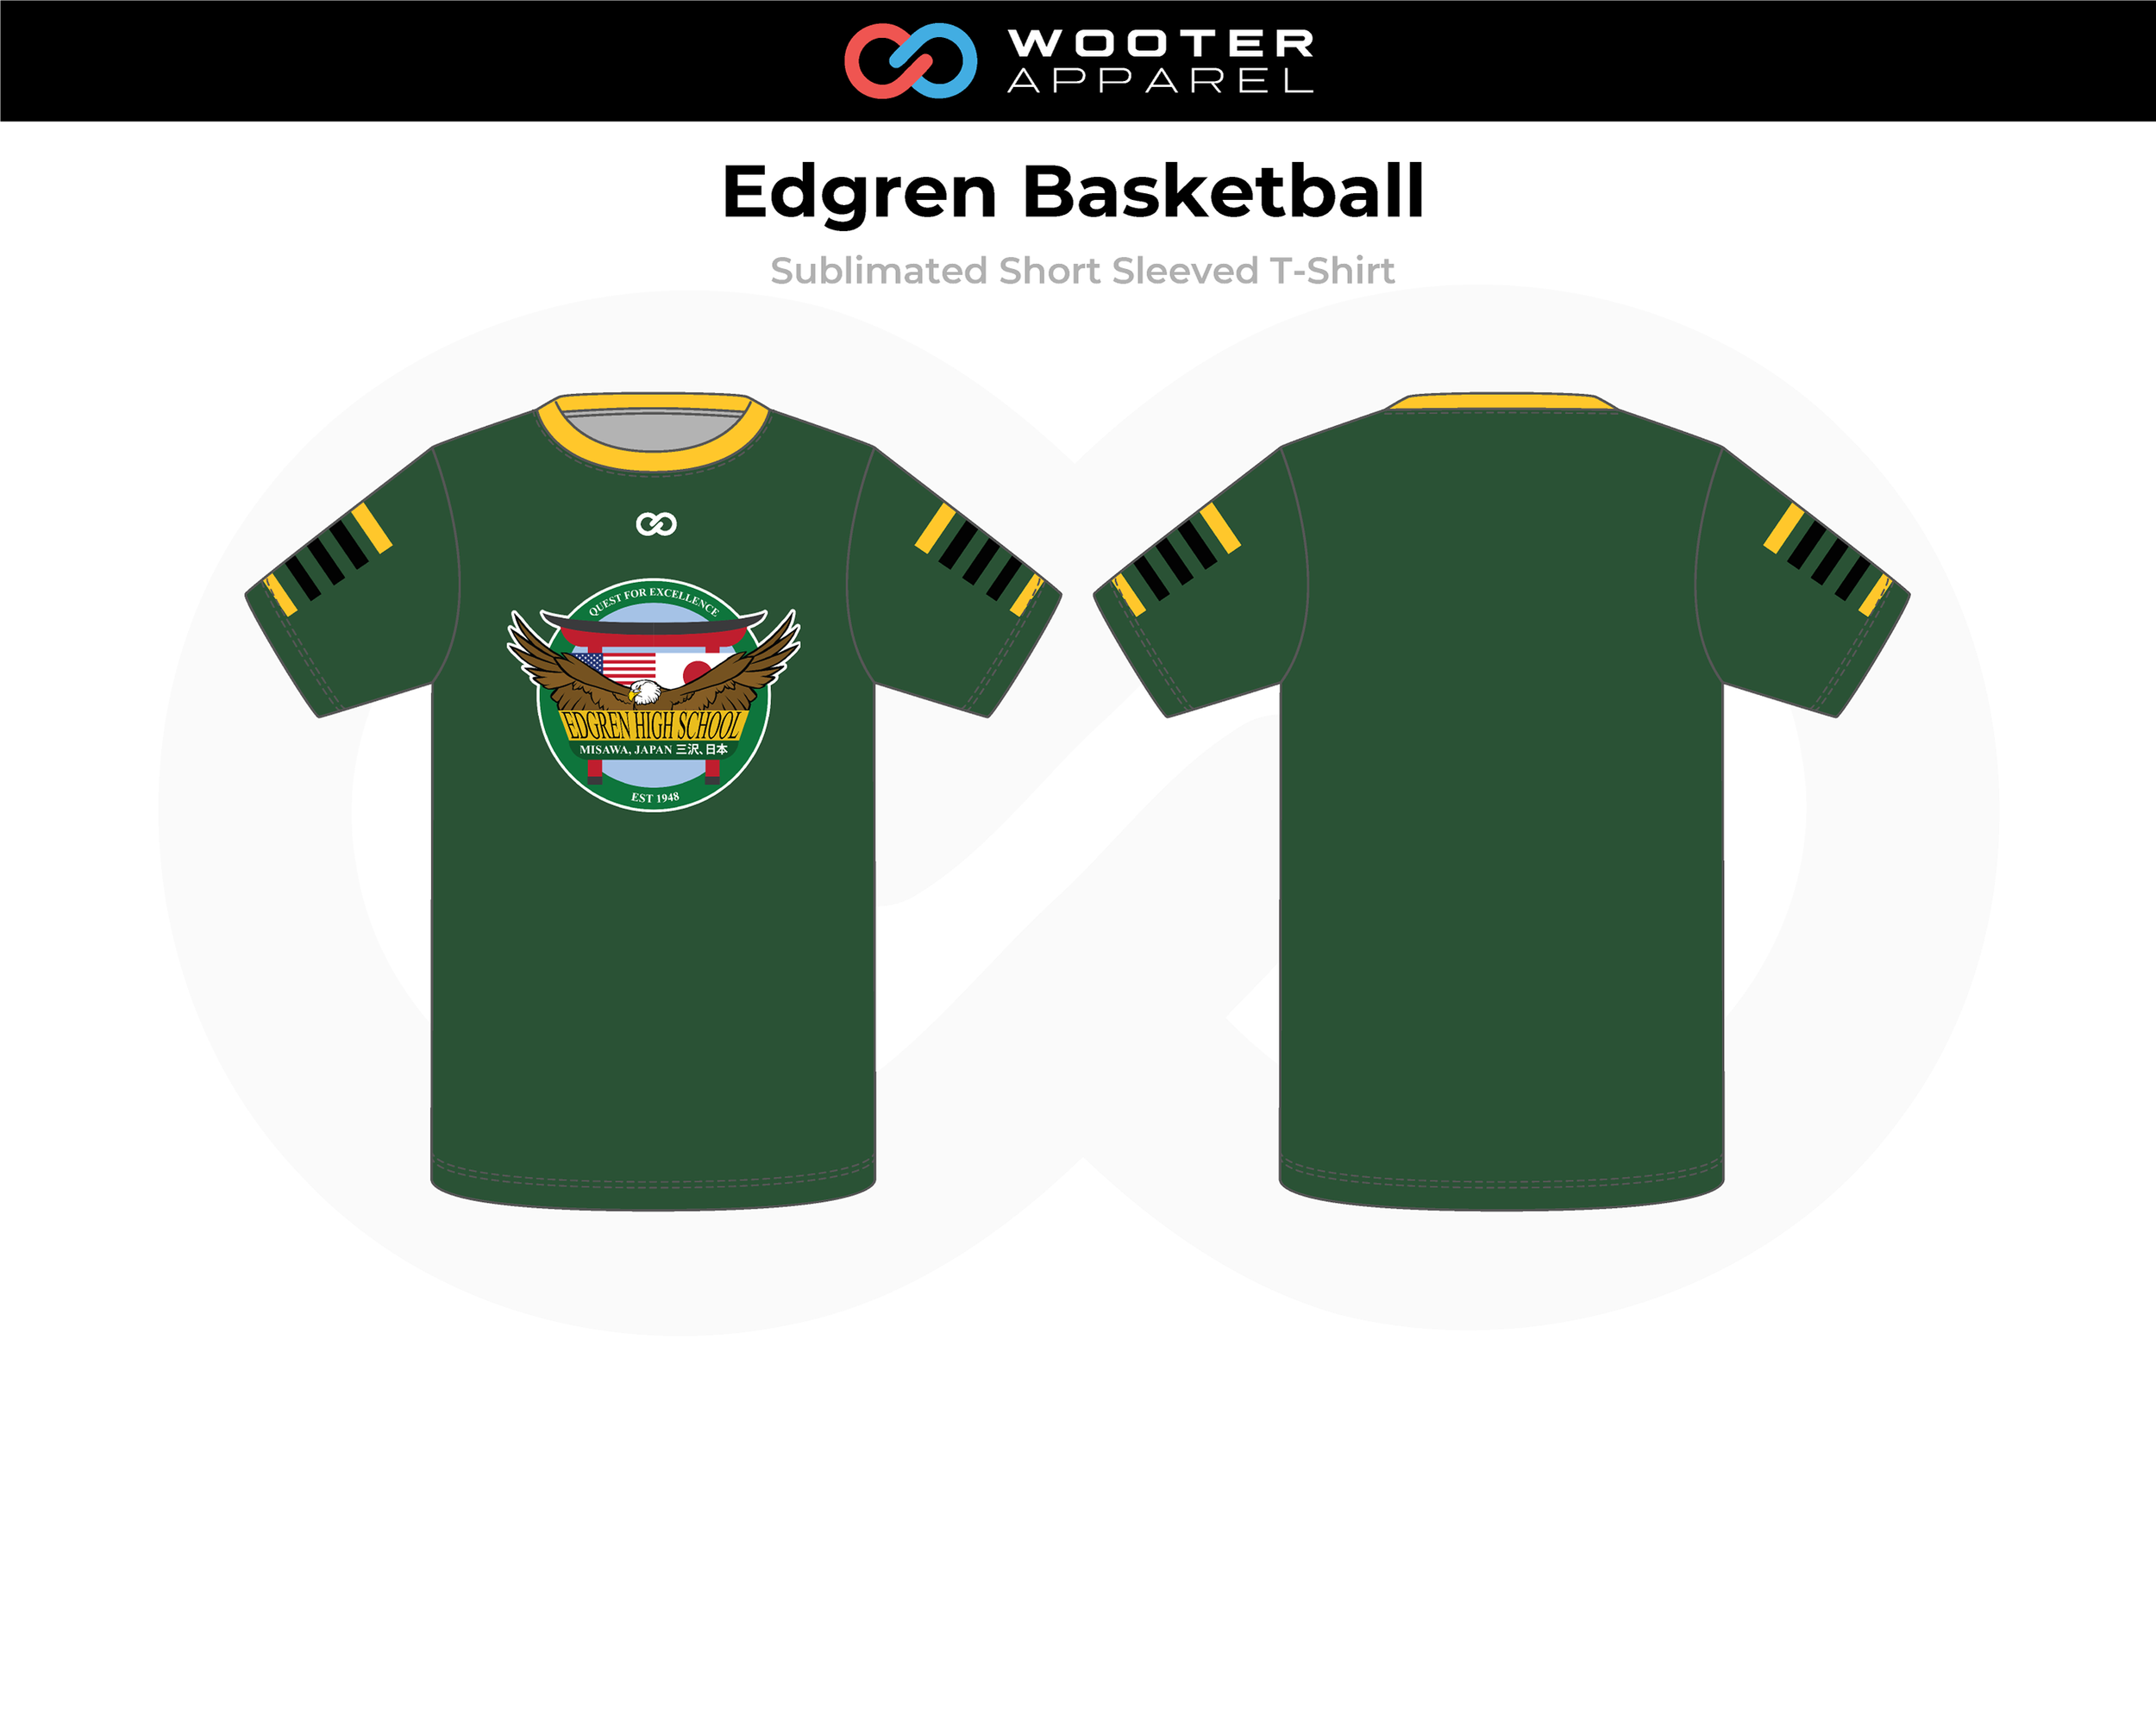 EDGREN Green Yellow Black Basketball Short Sleeved T-Shirt